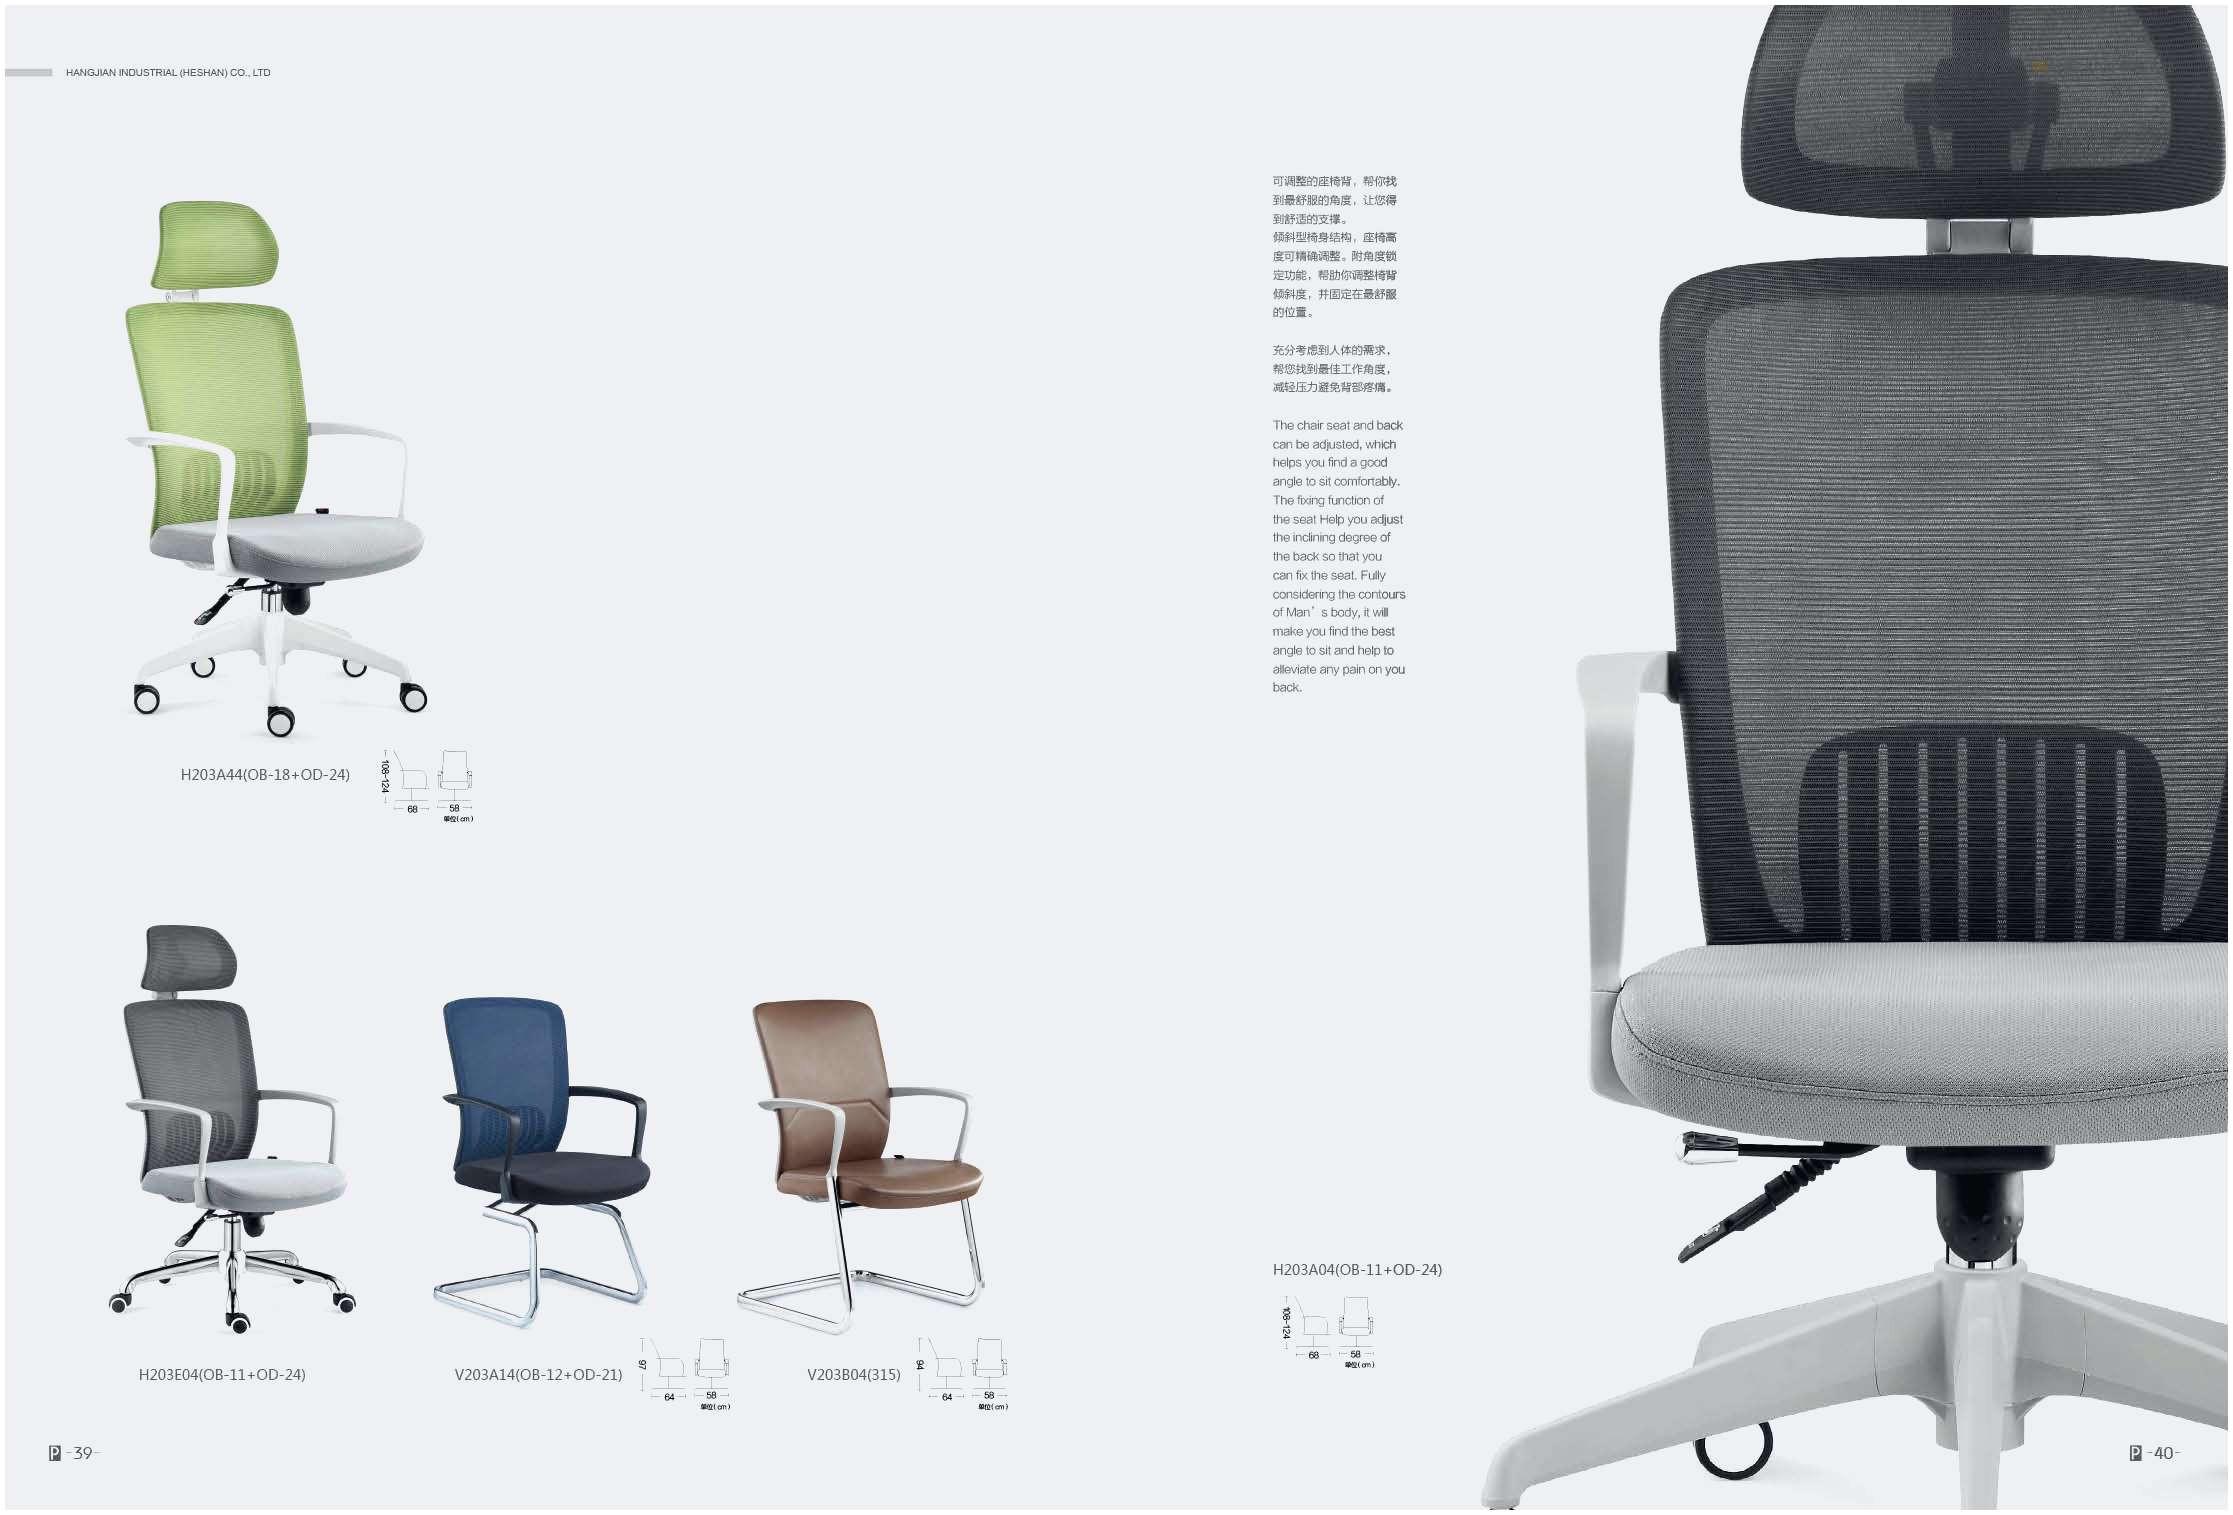 Furry Desk Chair Covers Frais Singular Saucer Chair Ikea Furry Desk Chair the Terrific Best